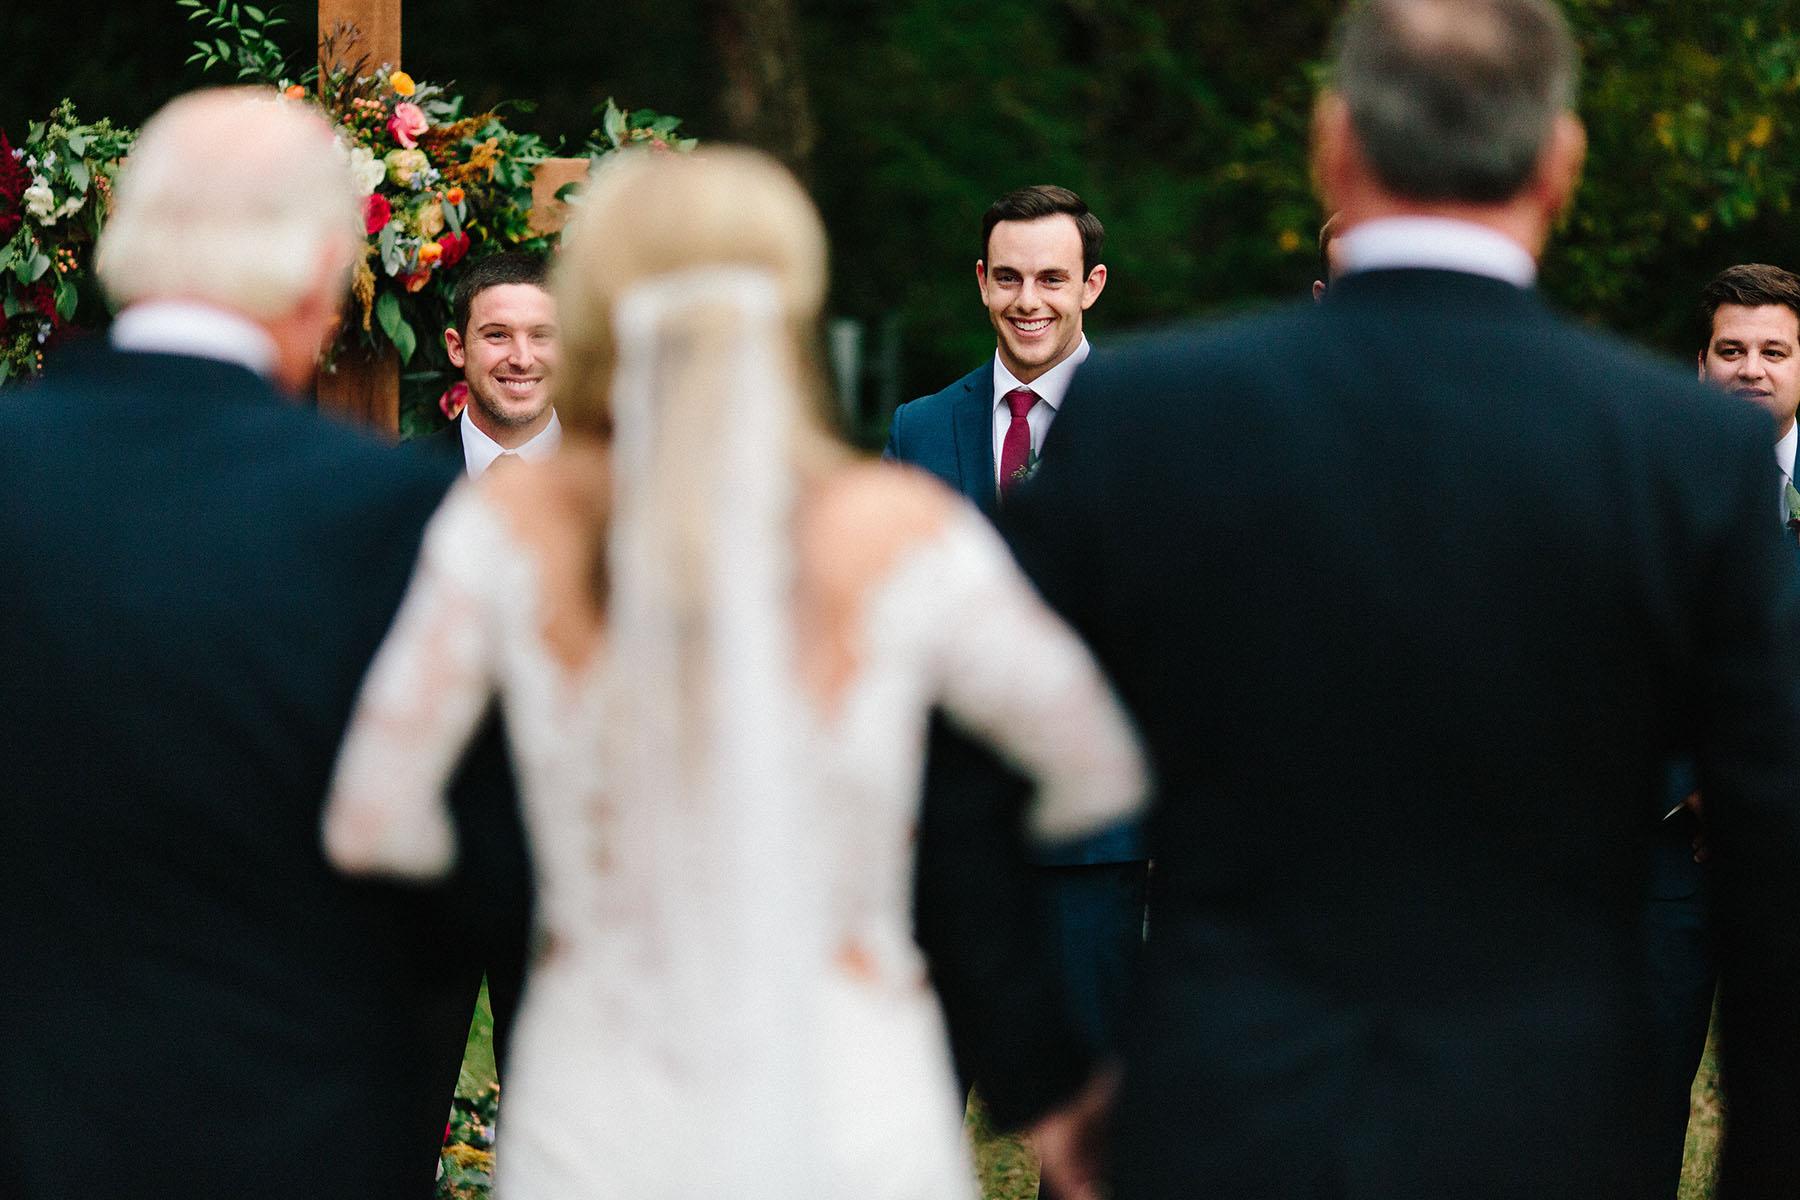 lauren_chad_wedding-118.jpg